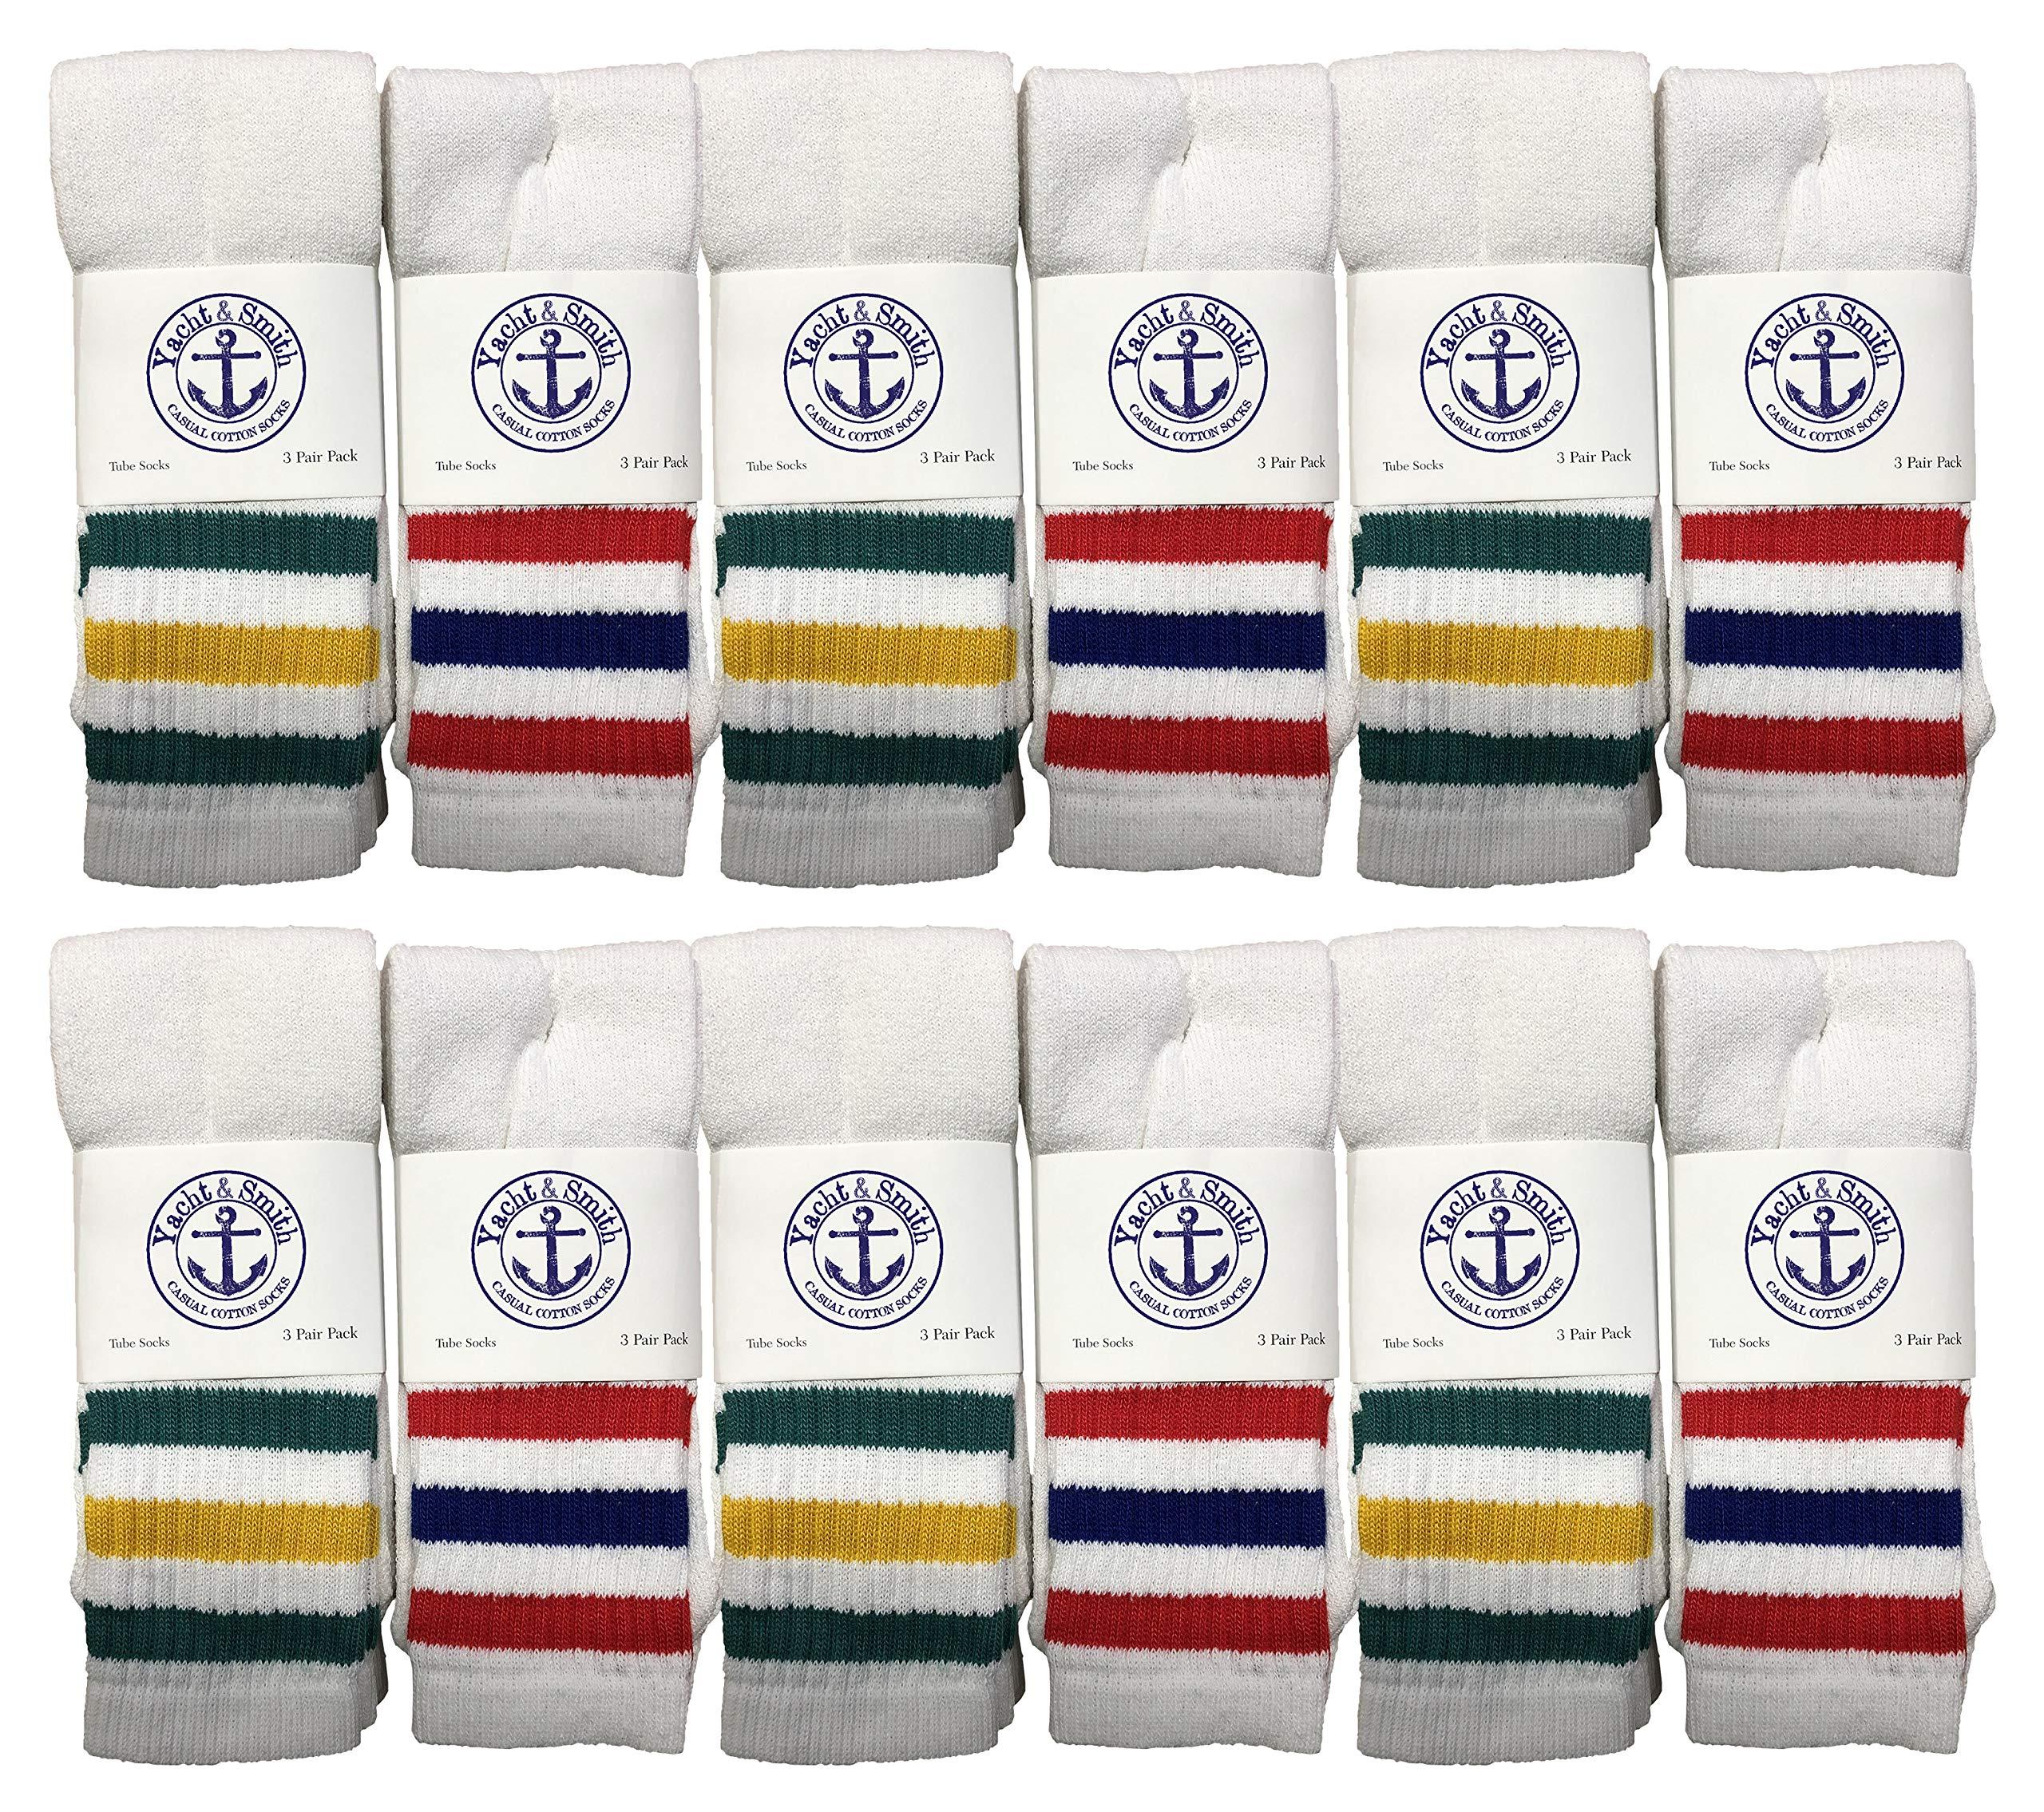 Yacht & Smith Wholesale Women's Tube Socks, Women's Cotton Referee Sport Socks Size 9-12 by Yacht & Smith